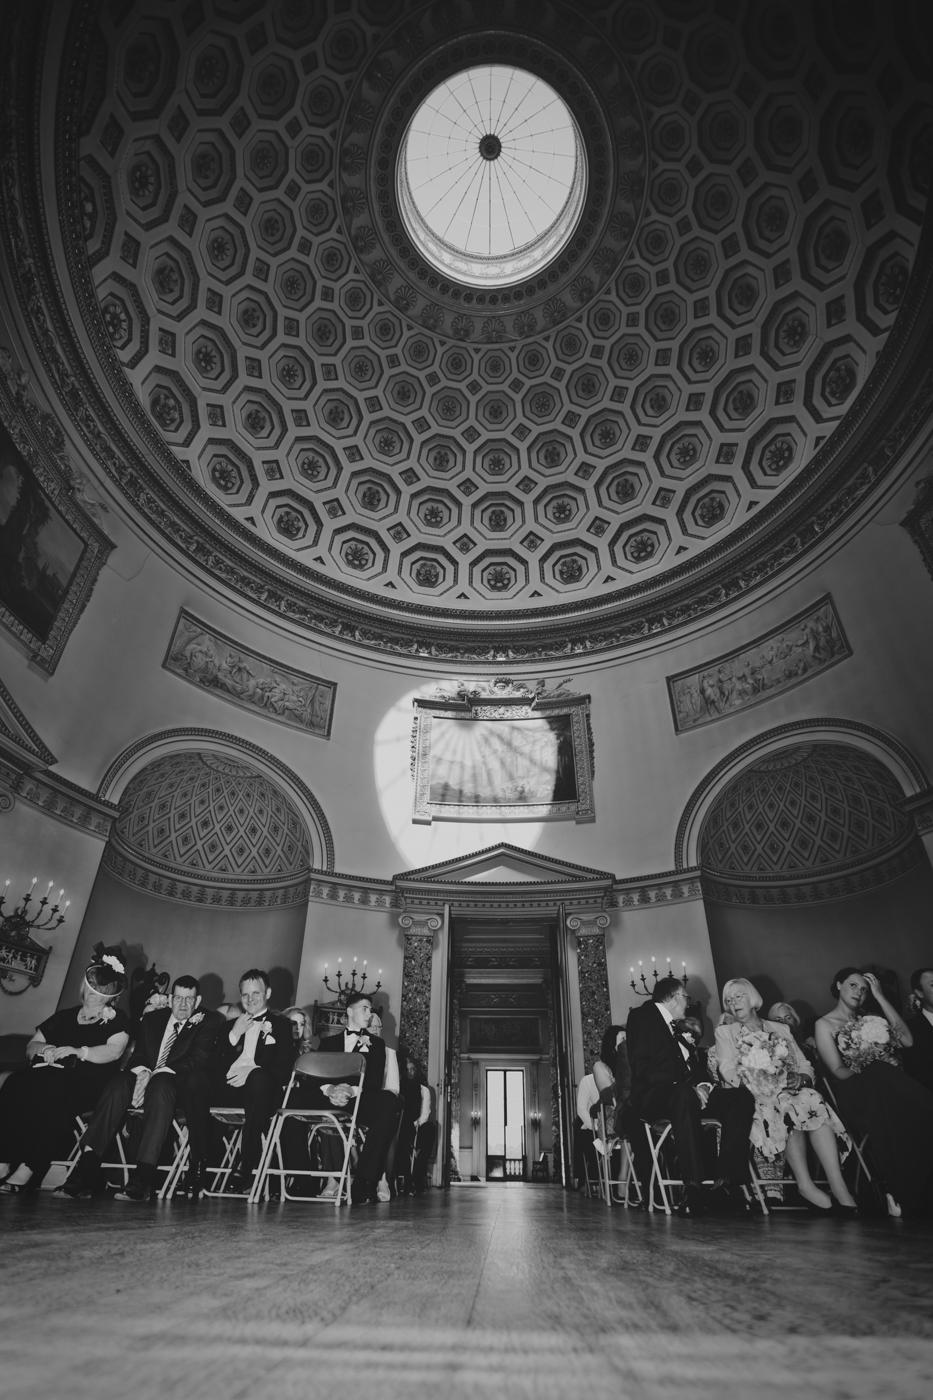 068 - Abi and Chris at Kedleston Hall - Wedding Photography by Mark Pugh www.markpugh.com - 0190.JPG